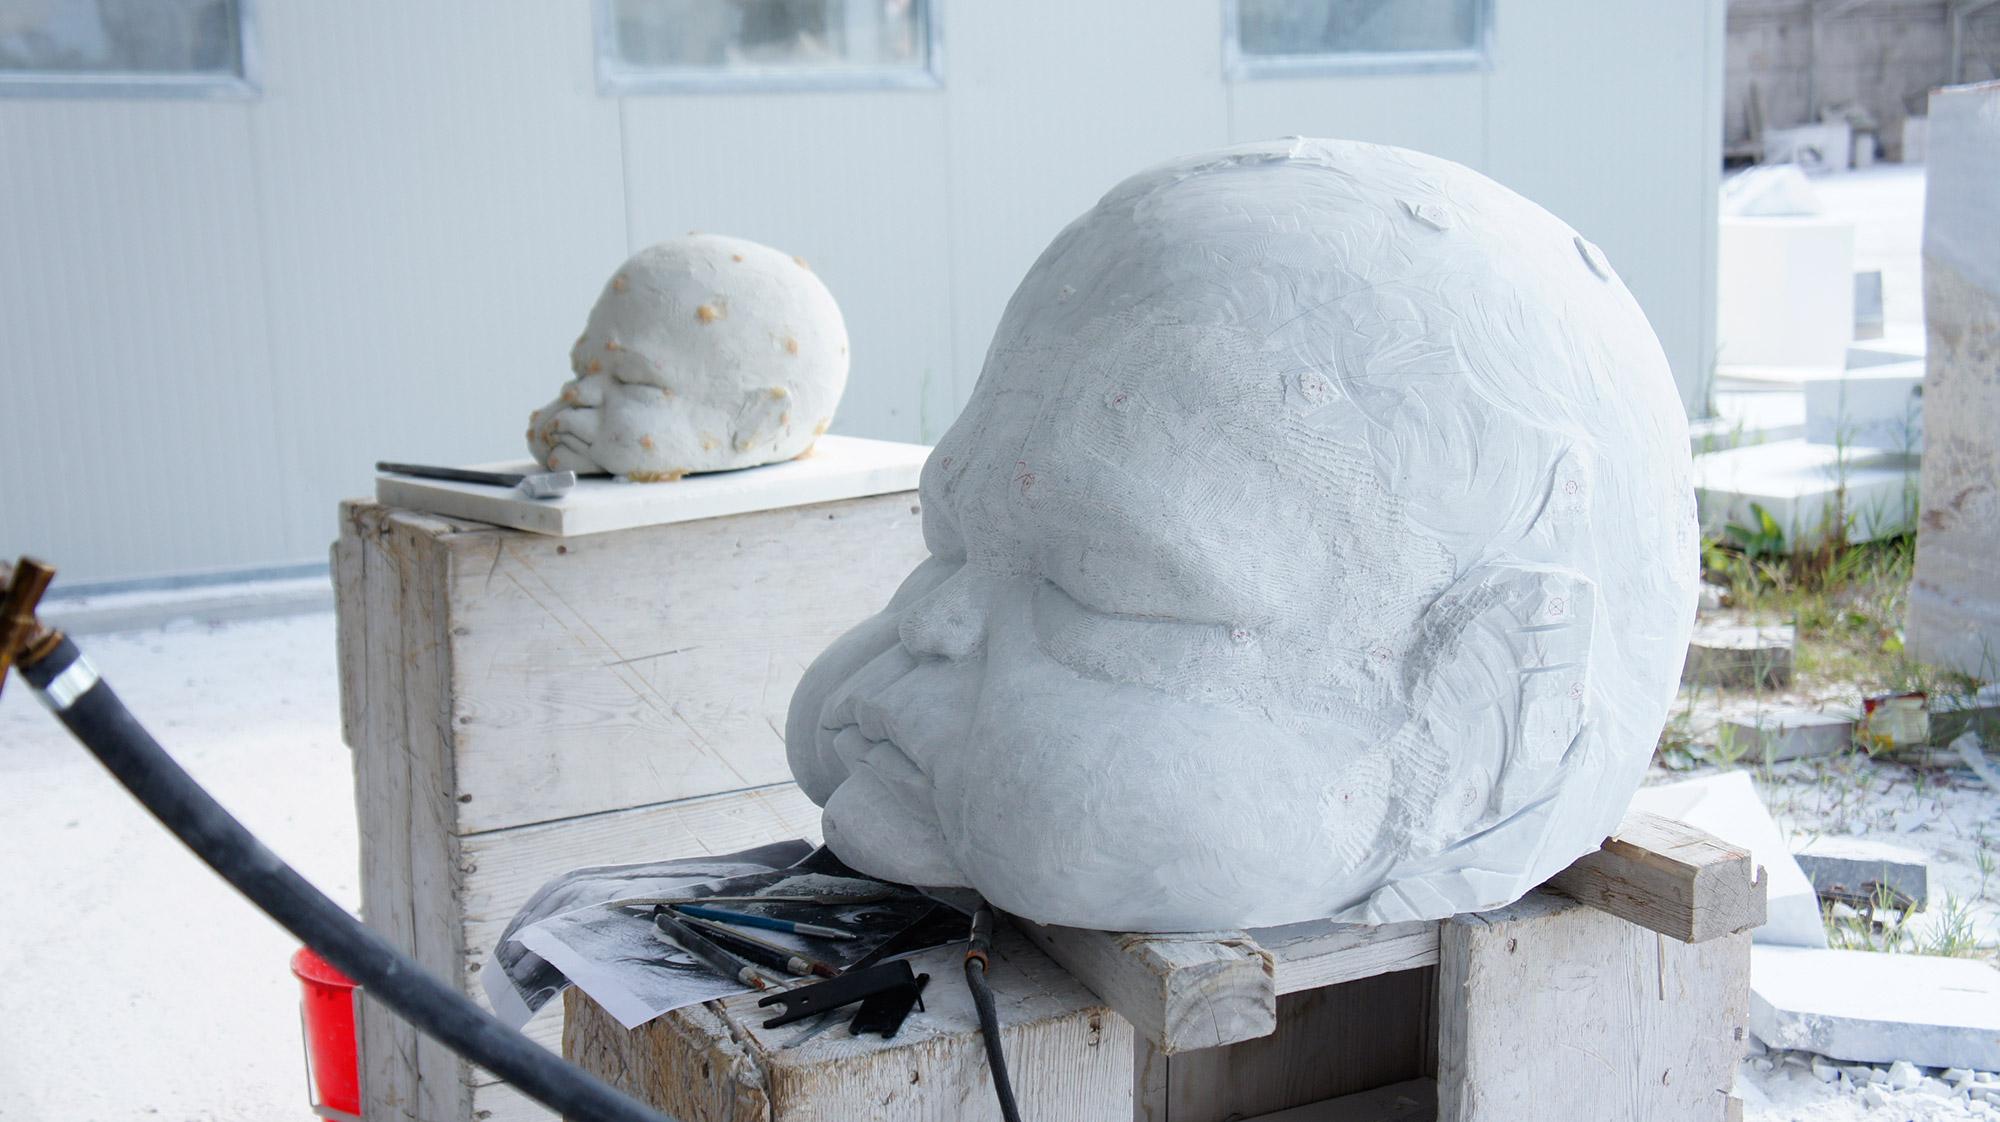 New-York-Academy-of-Art-Carrara-Residency-Brice-Esso-Jiannan-Wu20171213_0161.jpg